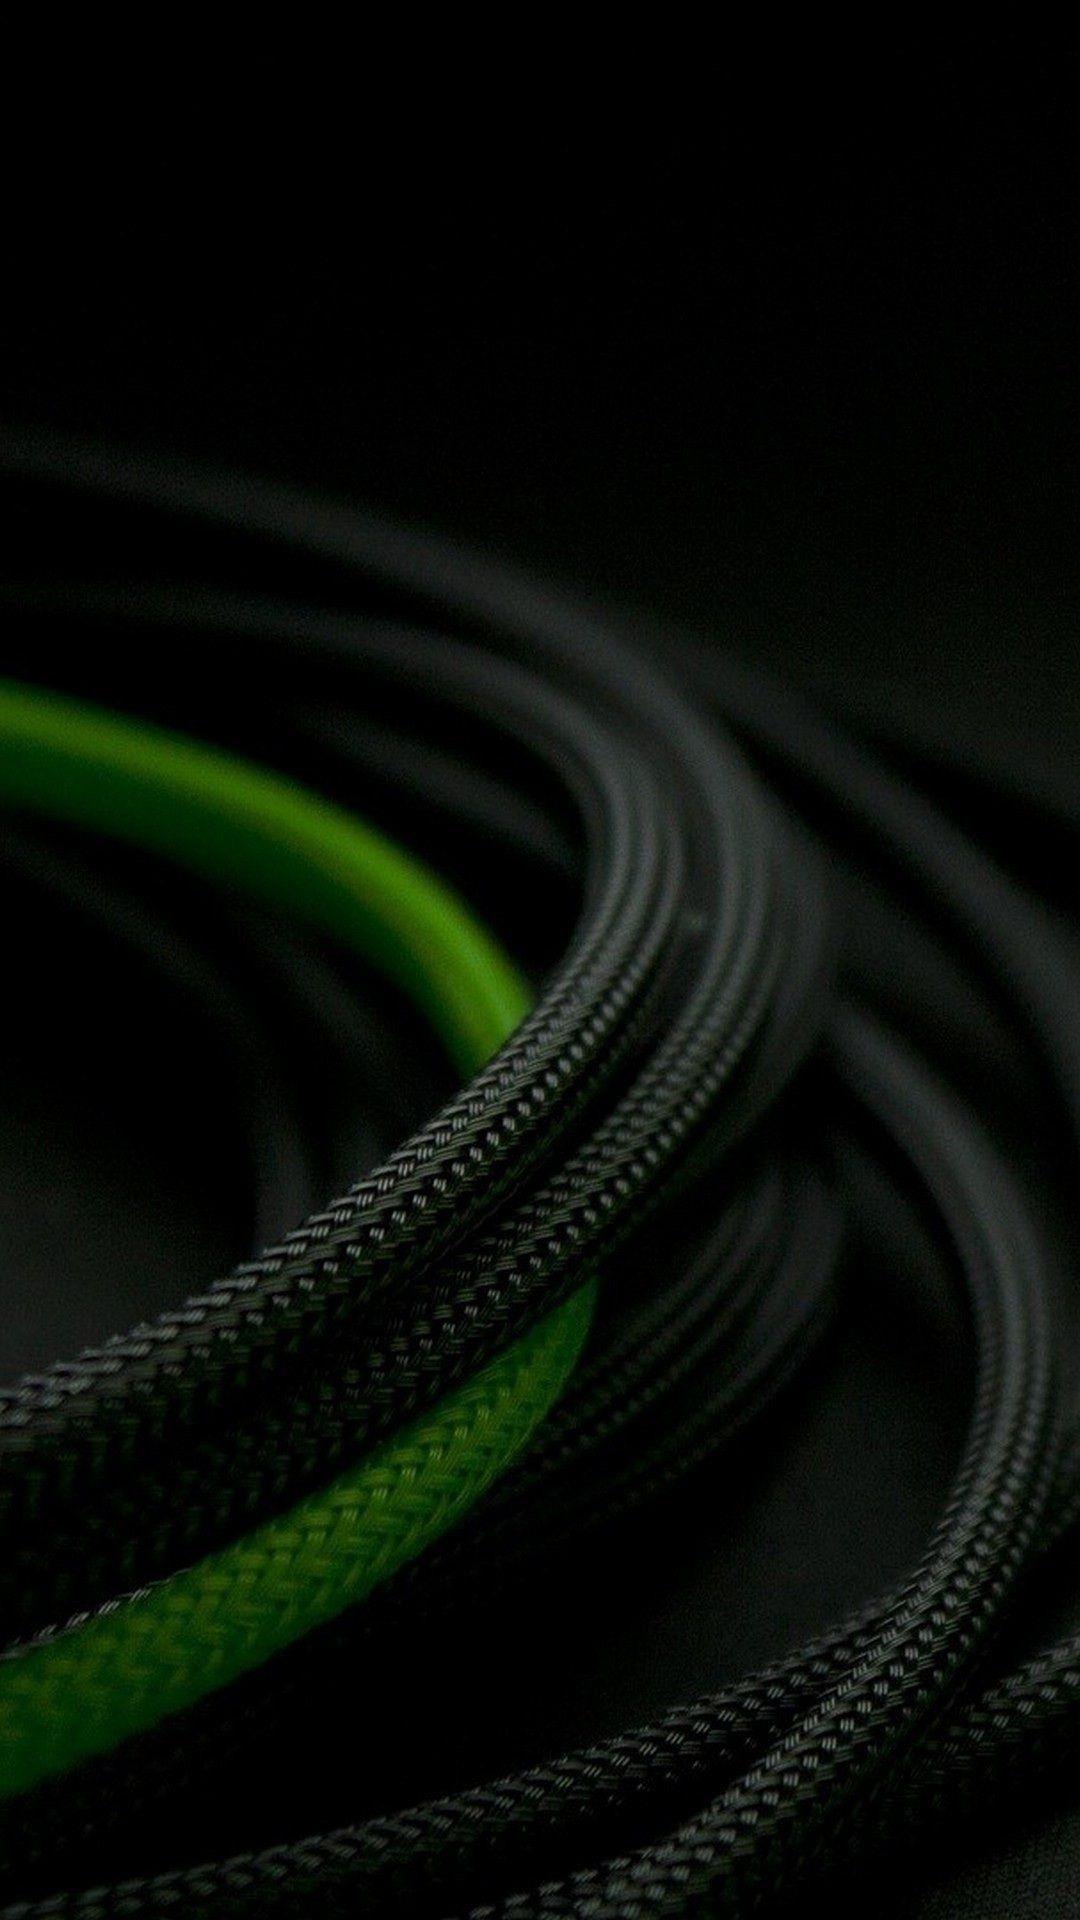 3d Black Green Rope Black Phone Wallpaper Mobile Wallpaper Hd Wallpapers For Mobile